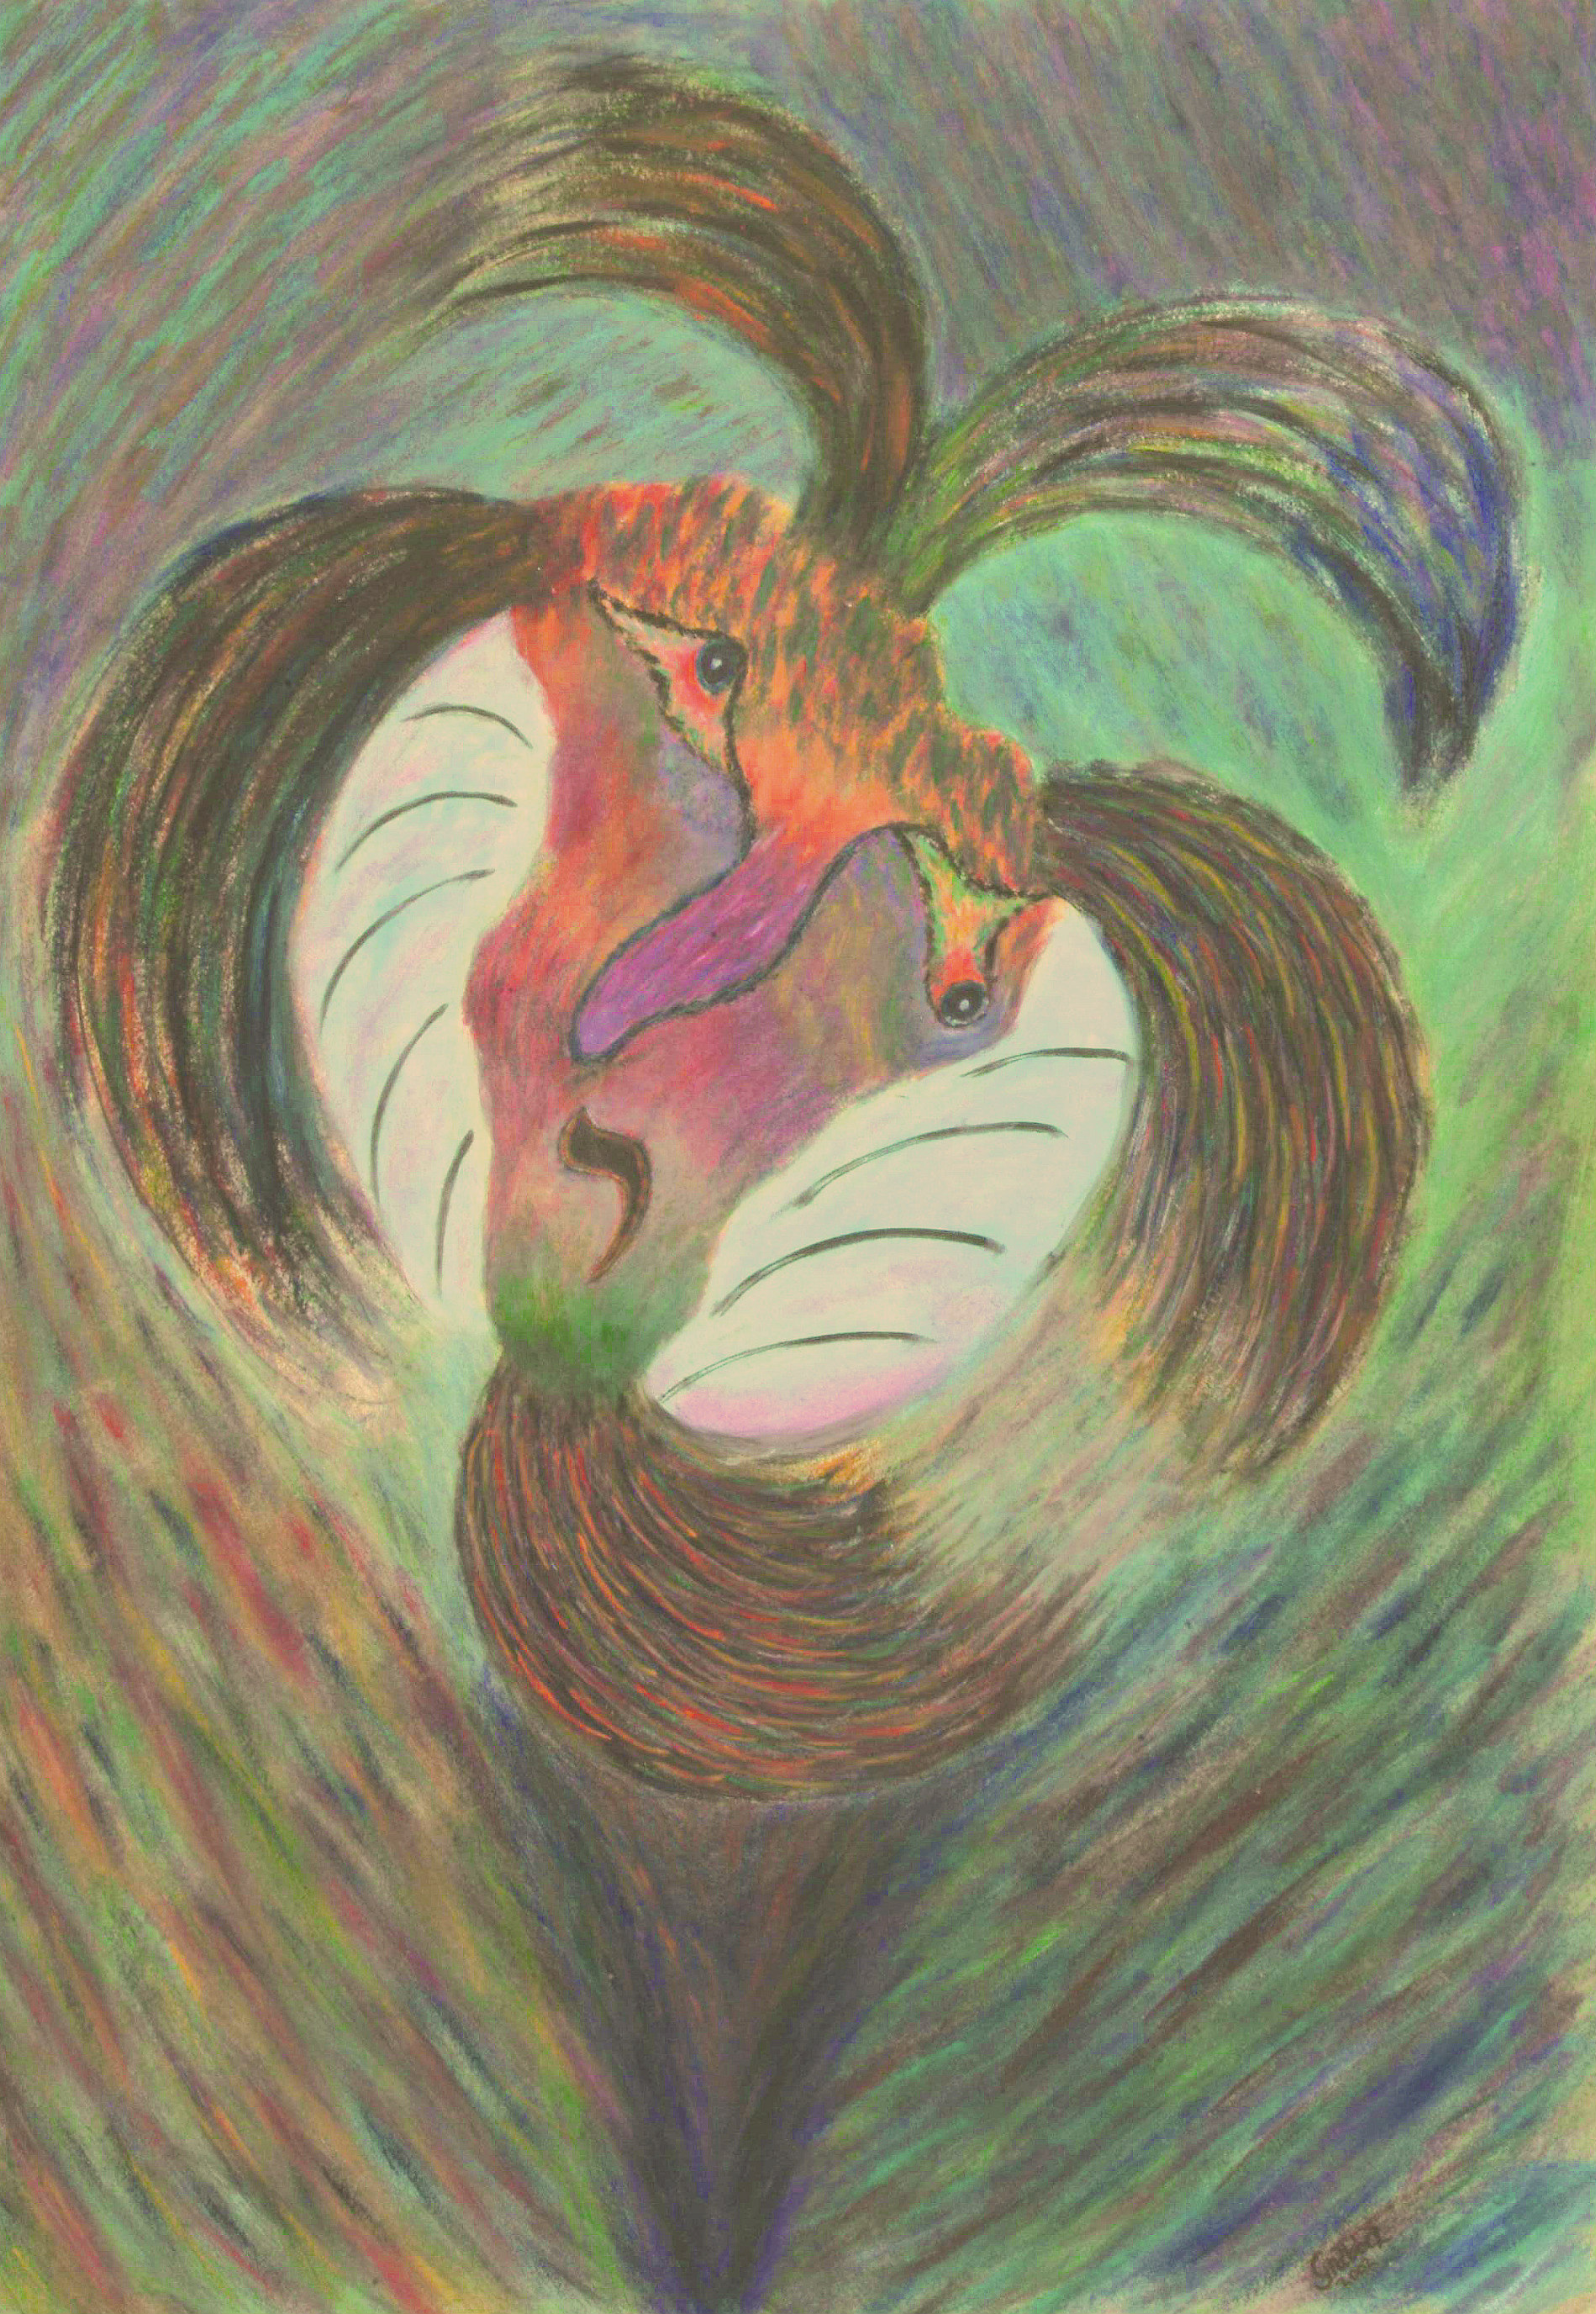 Whirlpool (acrylic on cardboard, 50x70 cm), 2002